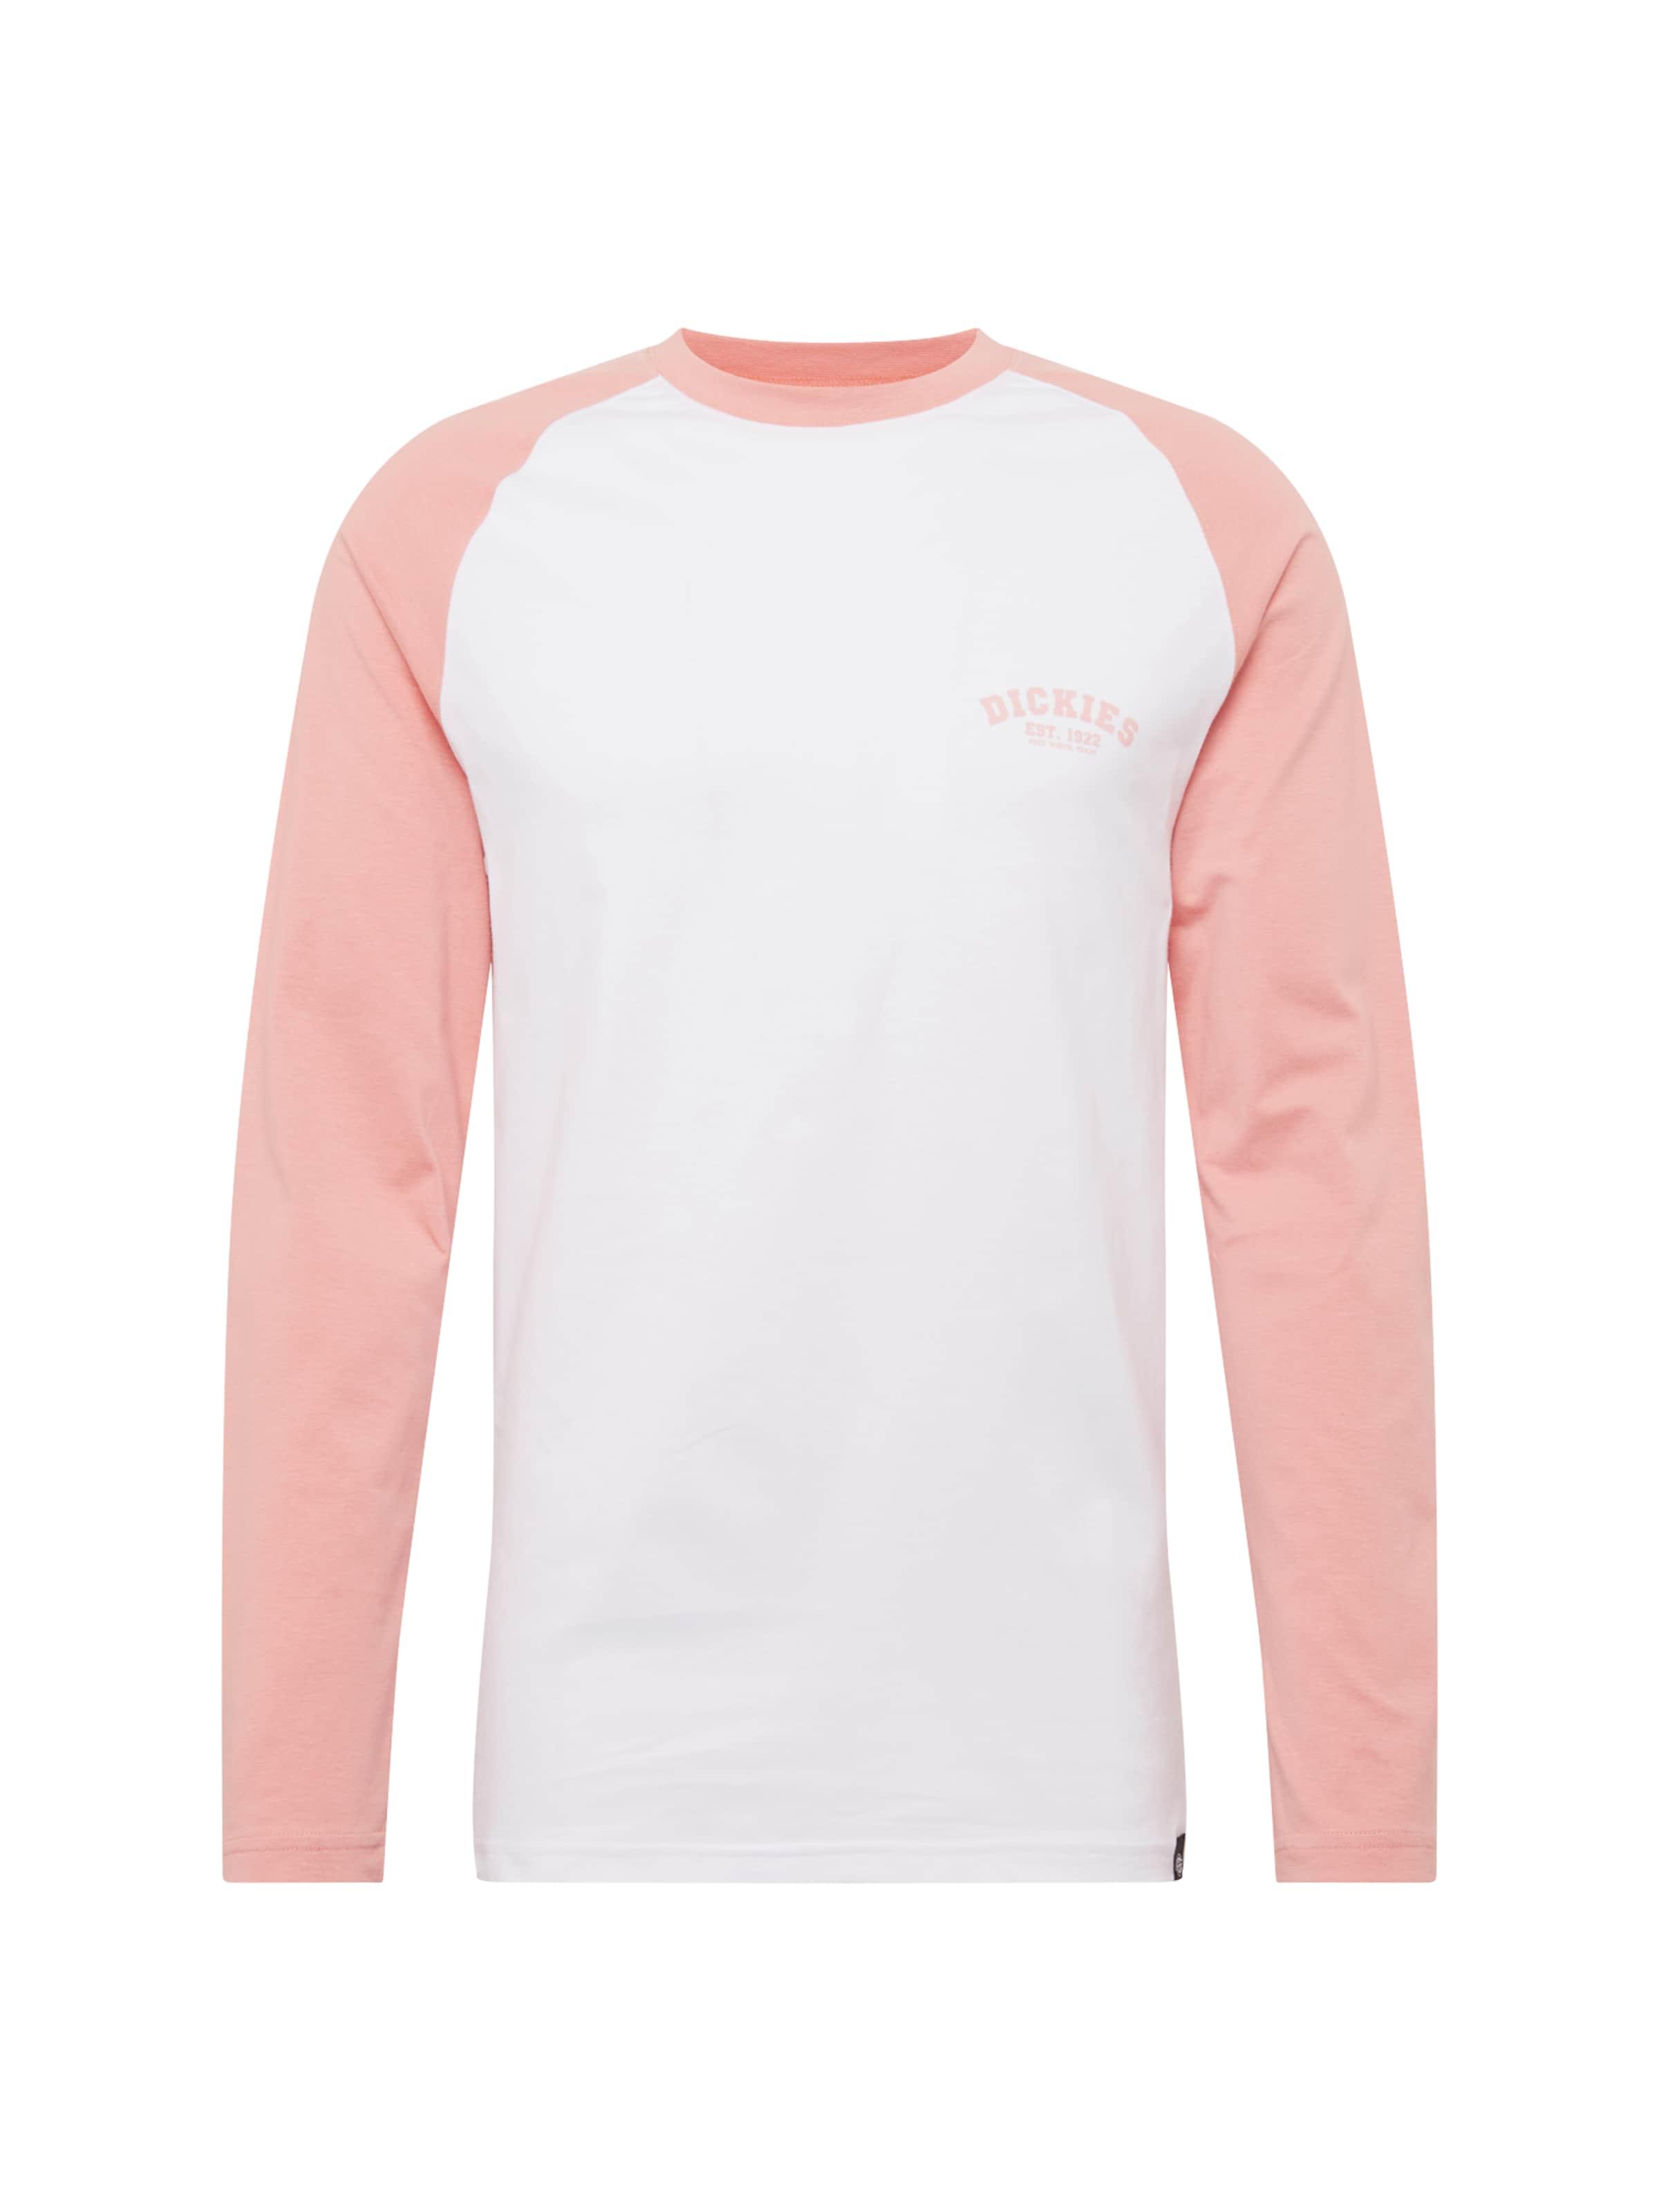 T RoseBlanc En shirt Dickies 'baseball' QxthdrCsB